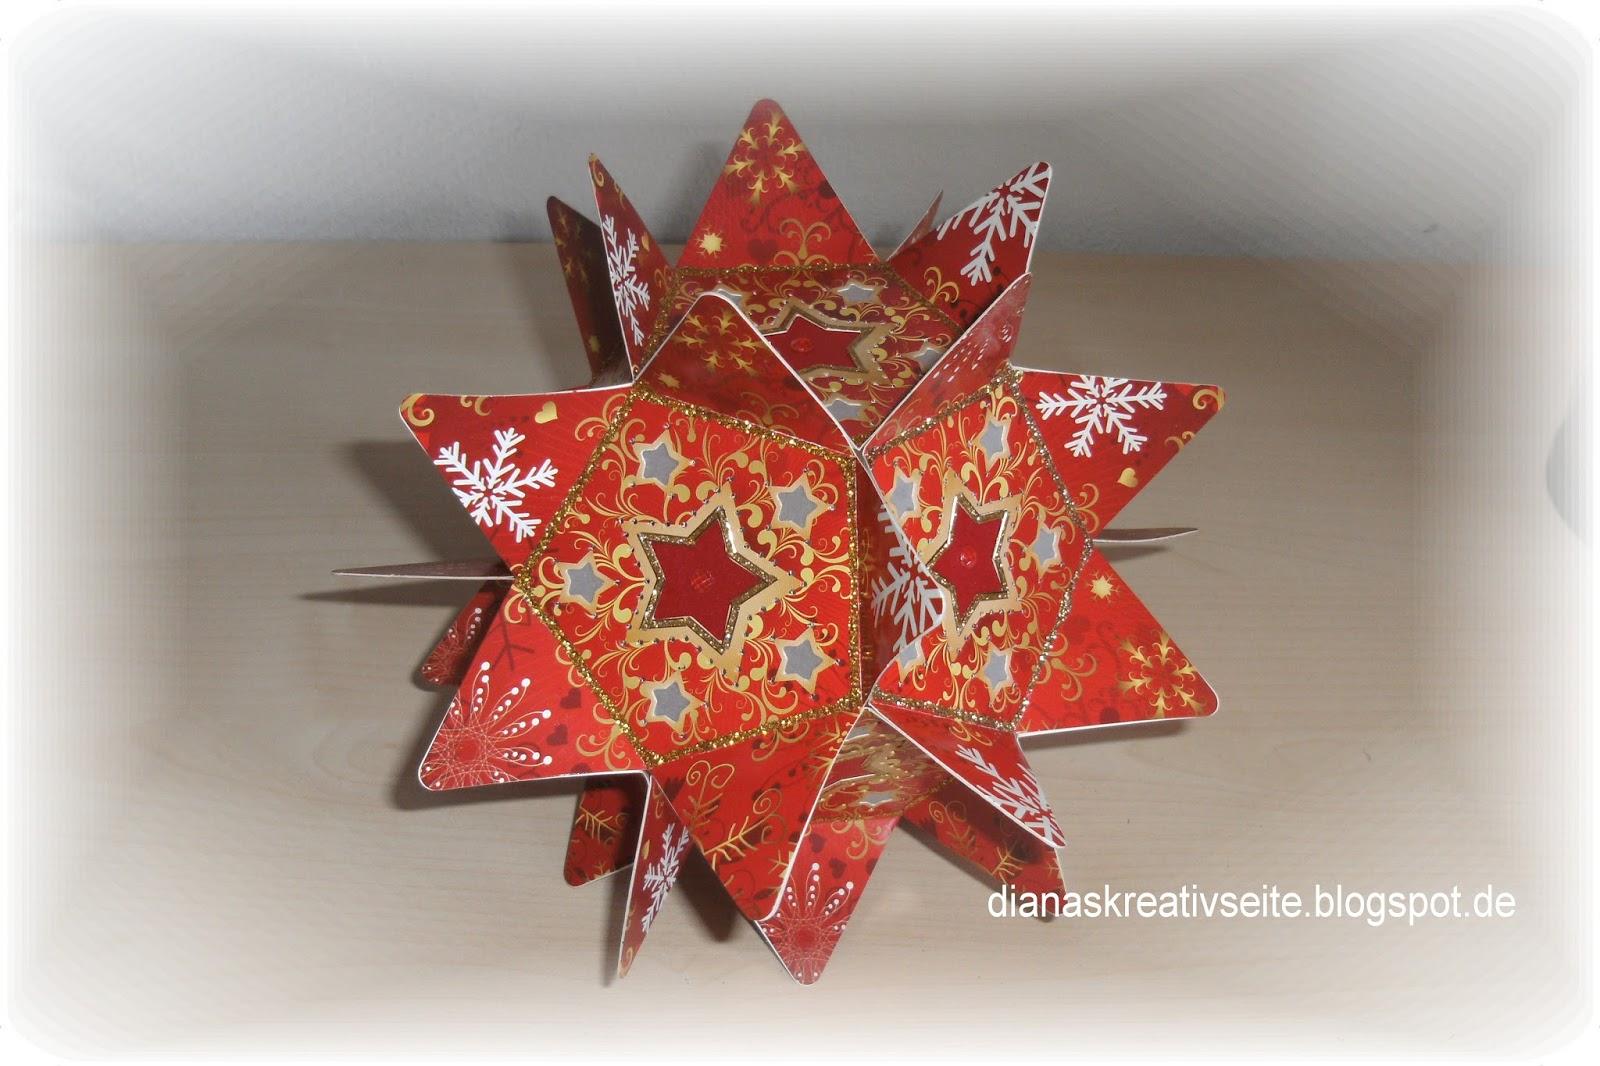 dianas kreativseite roter weihnachtsstern. Black Bedroom Furniture Sets. Home Design Ideas